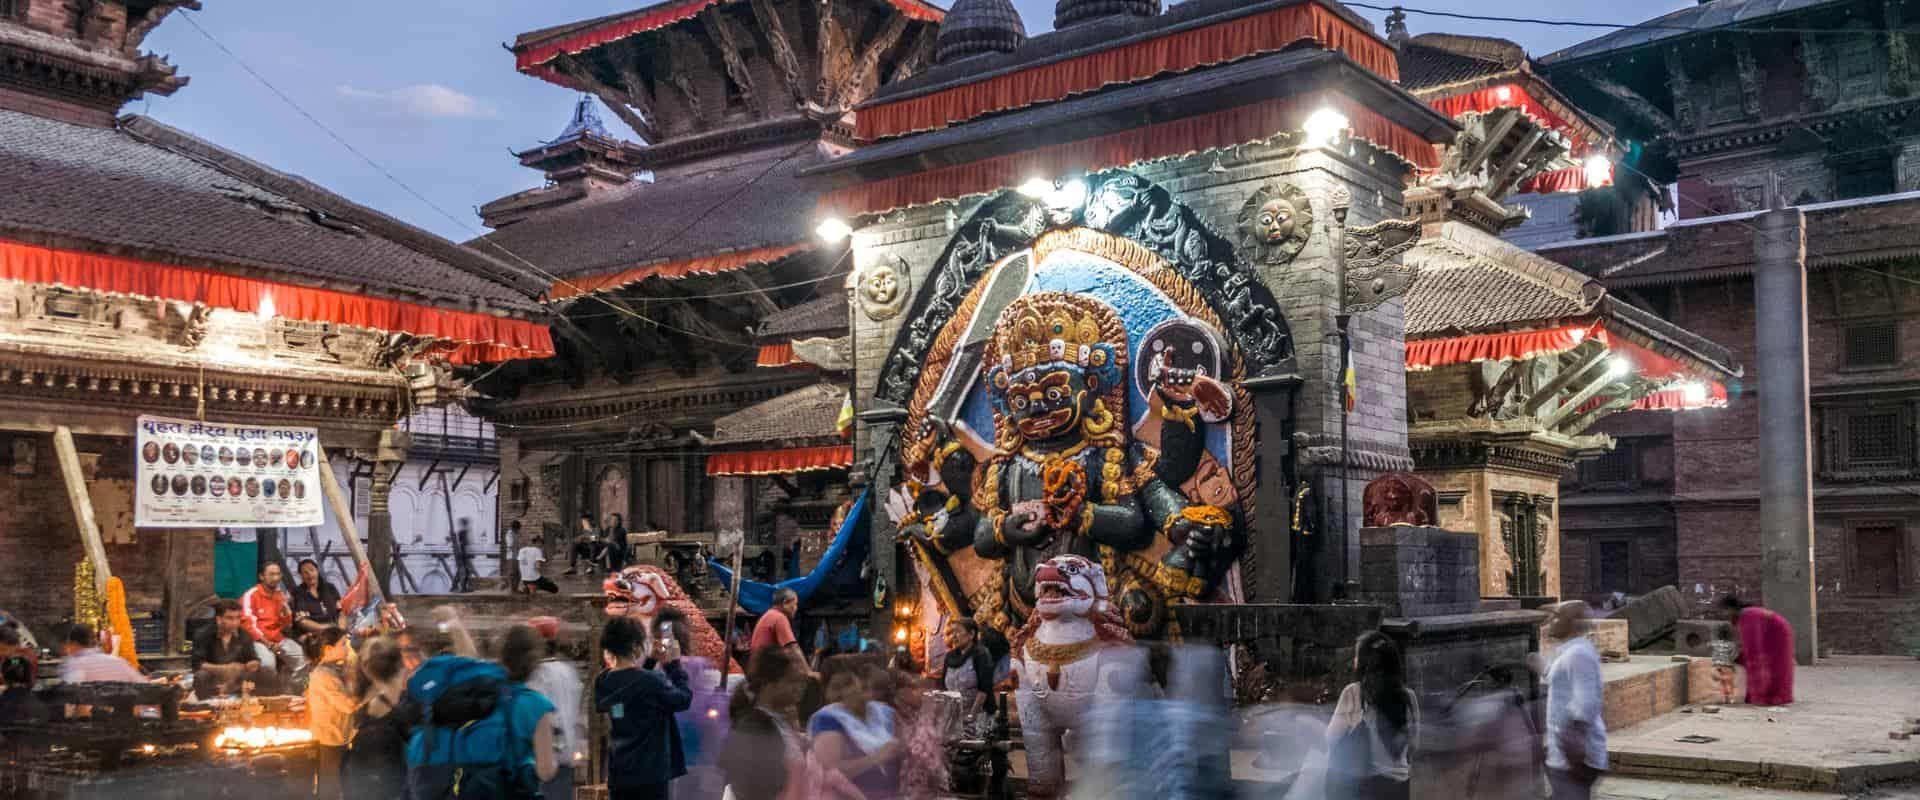 Kathmandu UNESCO Heritage Site